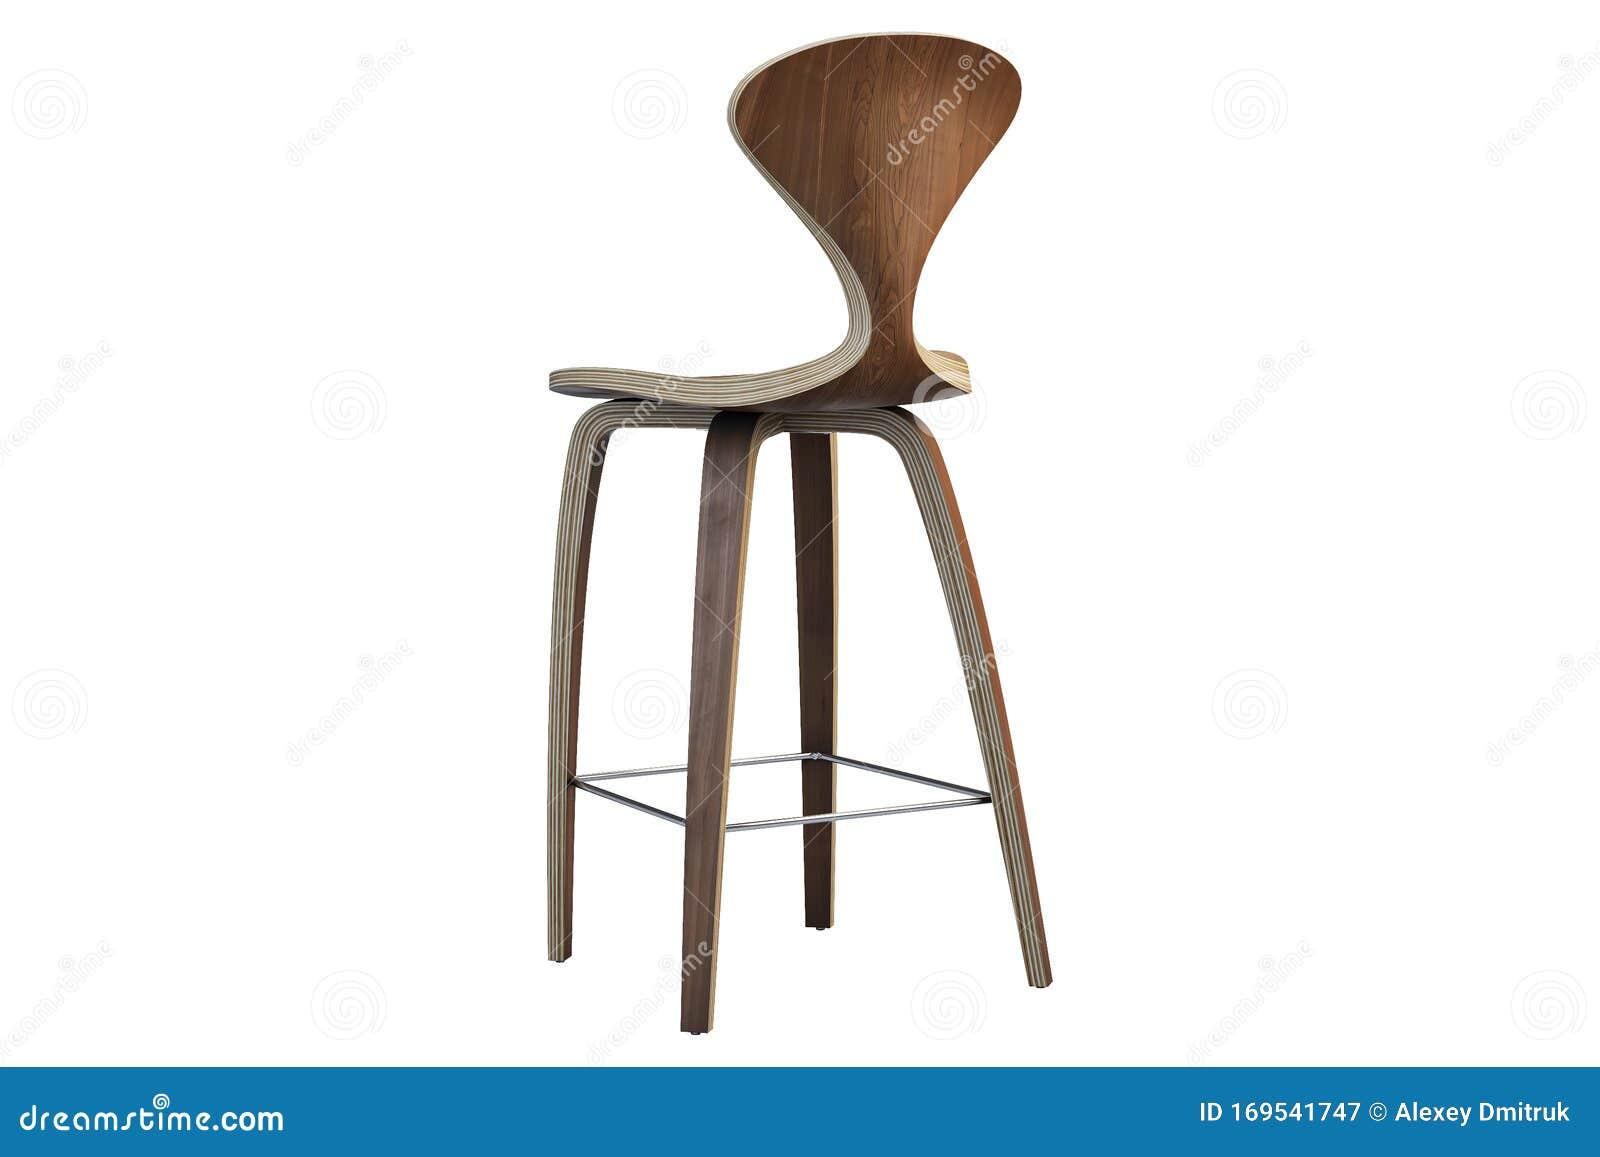 Image of: Modern Bar Stool On Wooden Legs 3d Render Stock Illustration Illustration Of Design Plywood 169541747